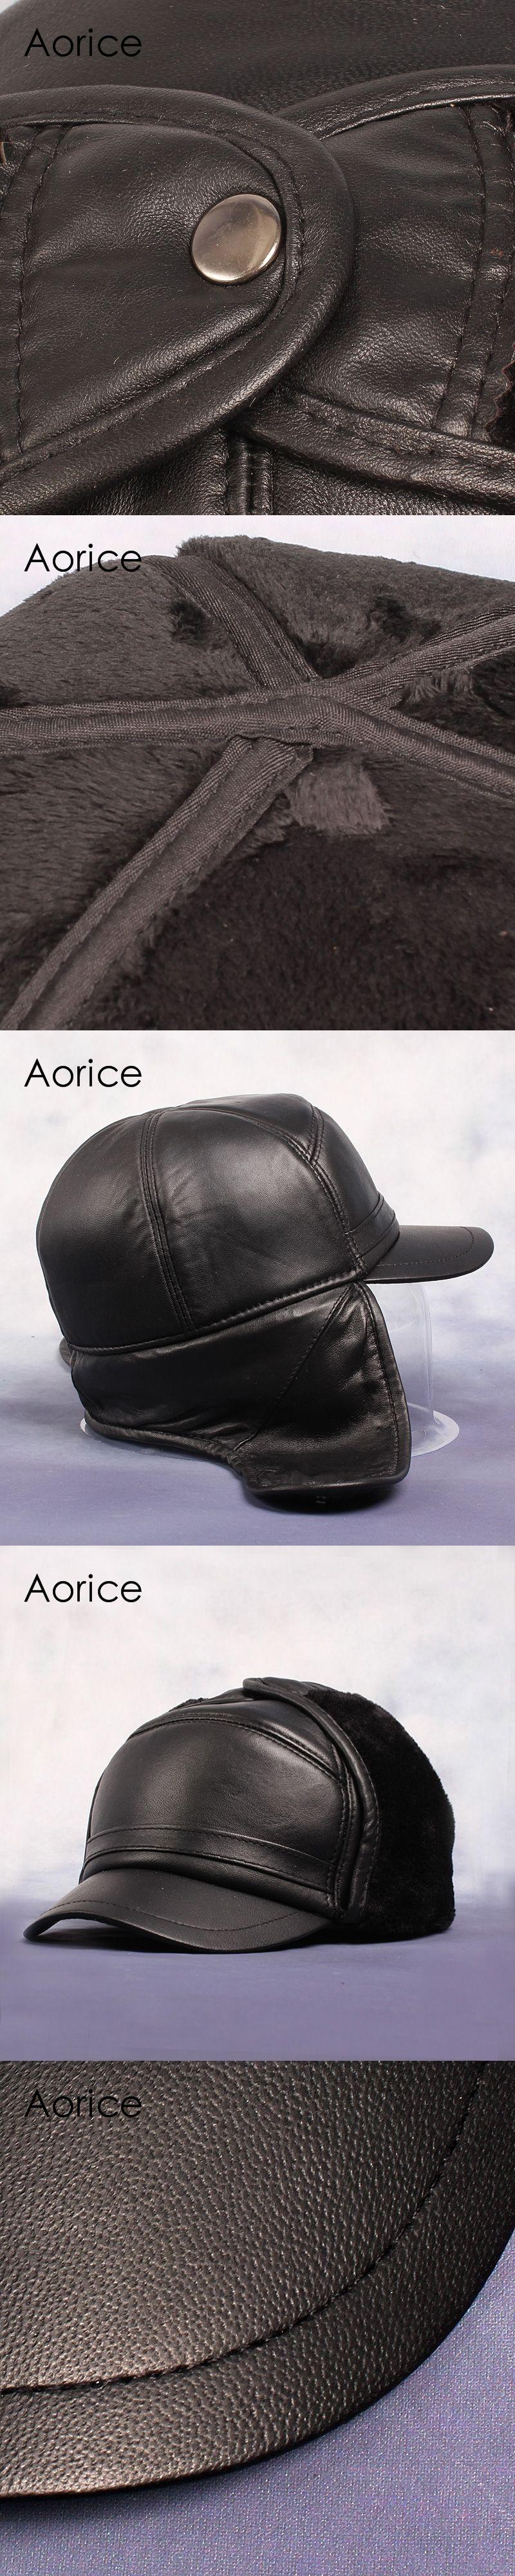 e1c56e2a7b8 HL055 Ball Cap BLACK Cap Ear wamer EarFlap Hat Skull Russian Unisex hats  caps brand new winter warm baseball caps hats